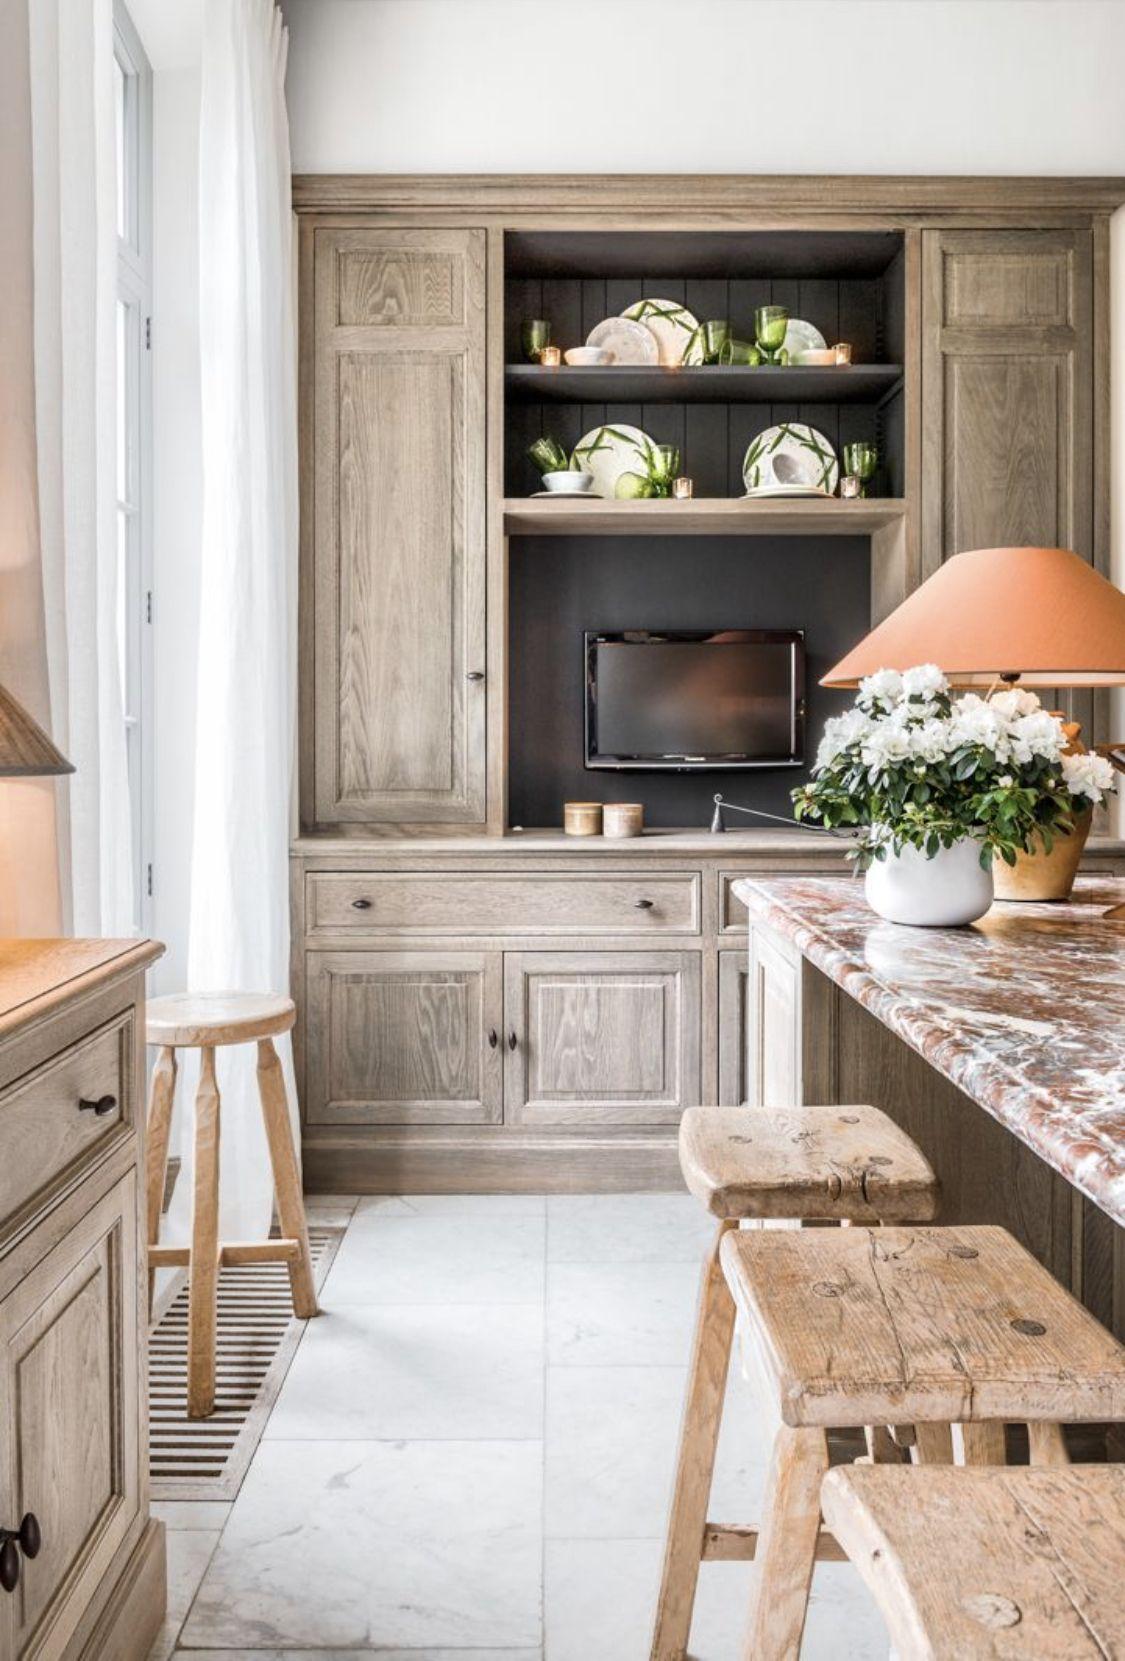 French Oak Cottage Kitchen Design Modern Kitchen Cabinet Design Italian Kitchen Design